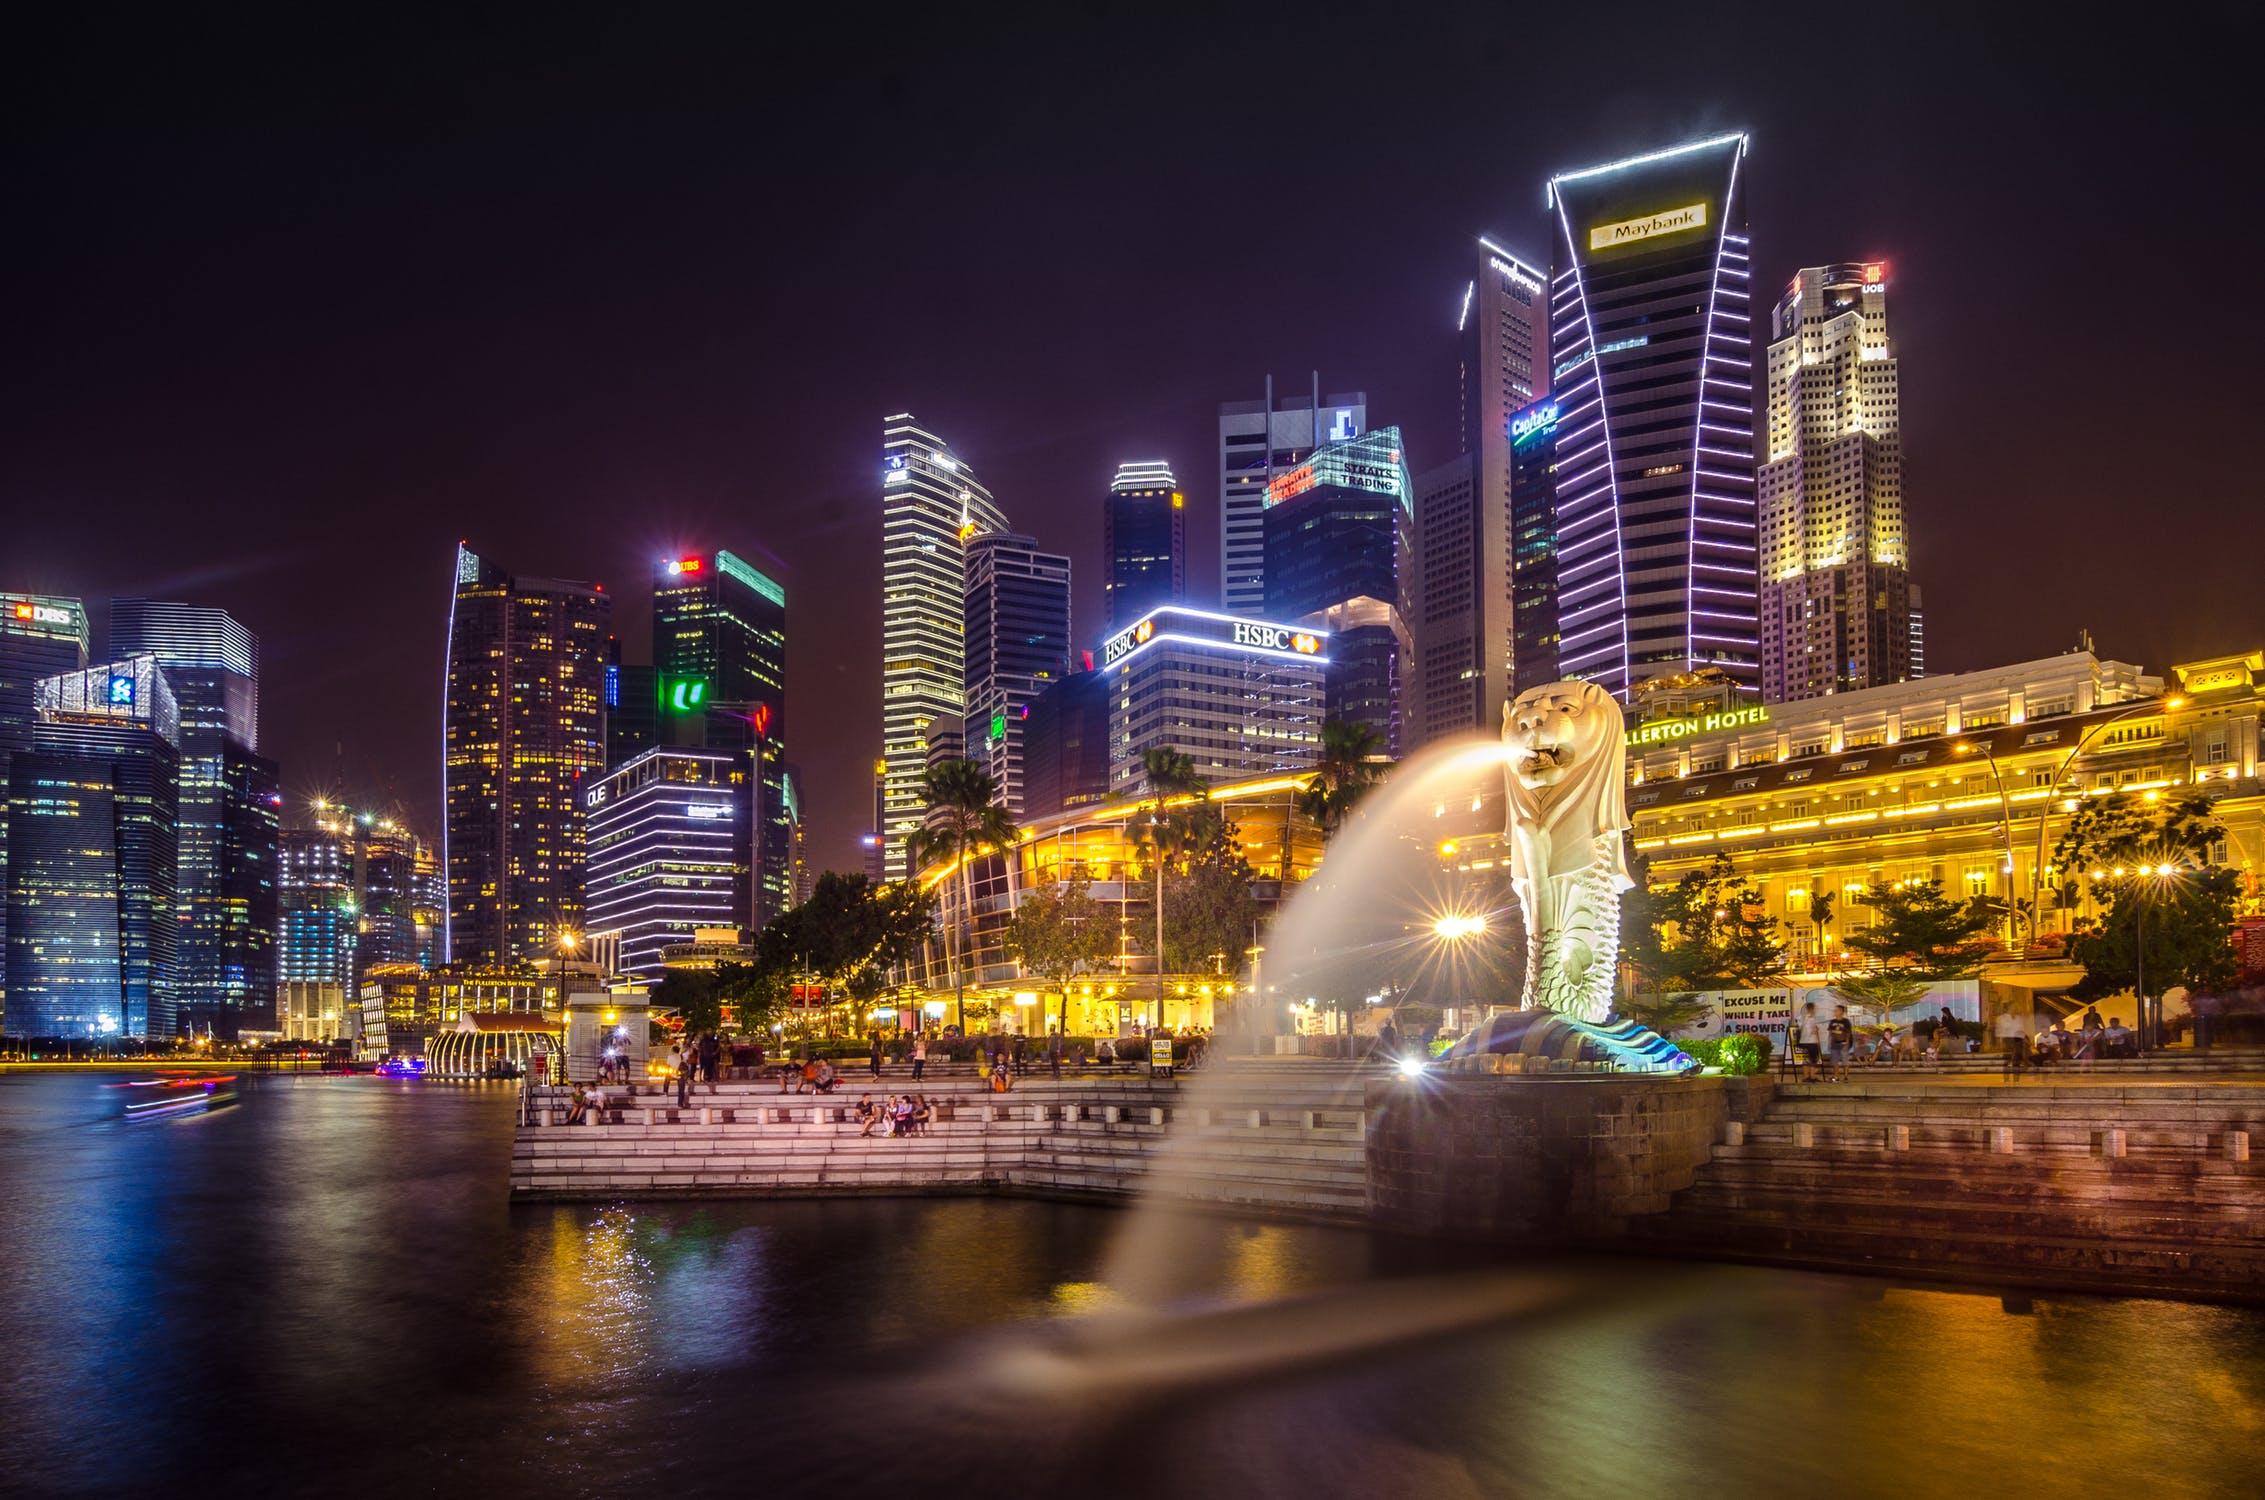 Knight Frank最新报告:新加坡超越香港成全球升值最快高端住宅市场